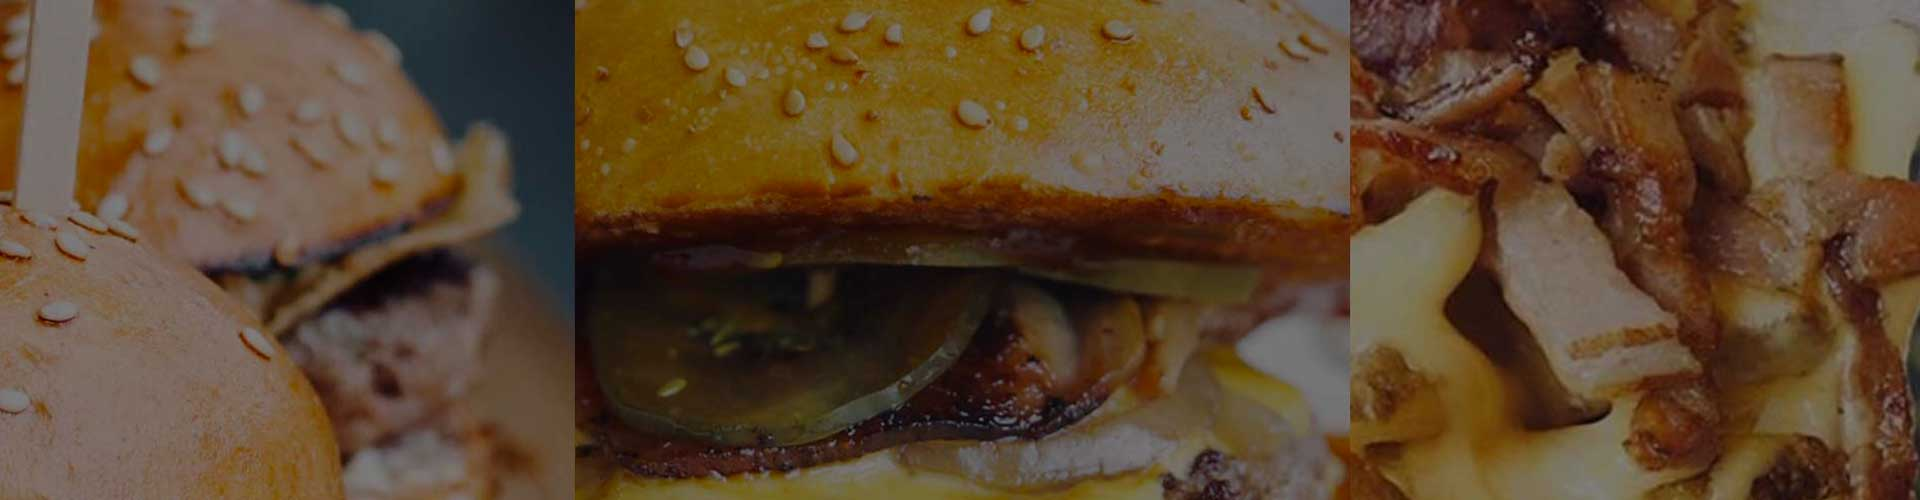 1920x500-mamie-burger